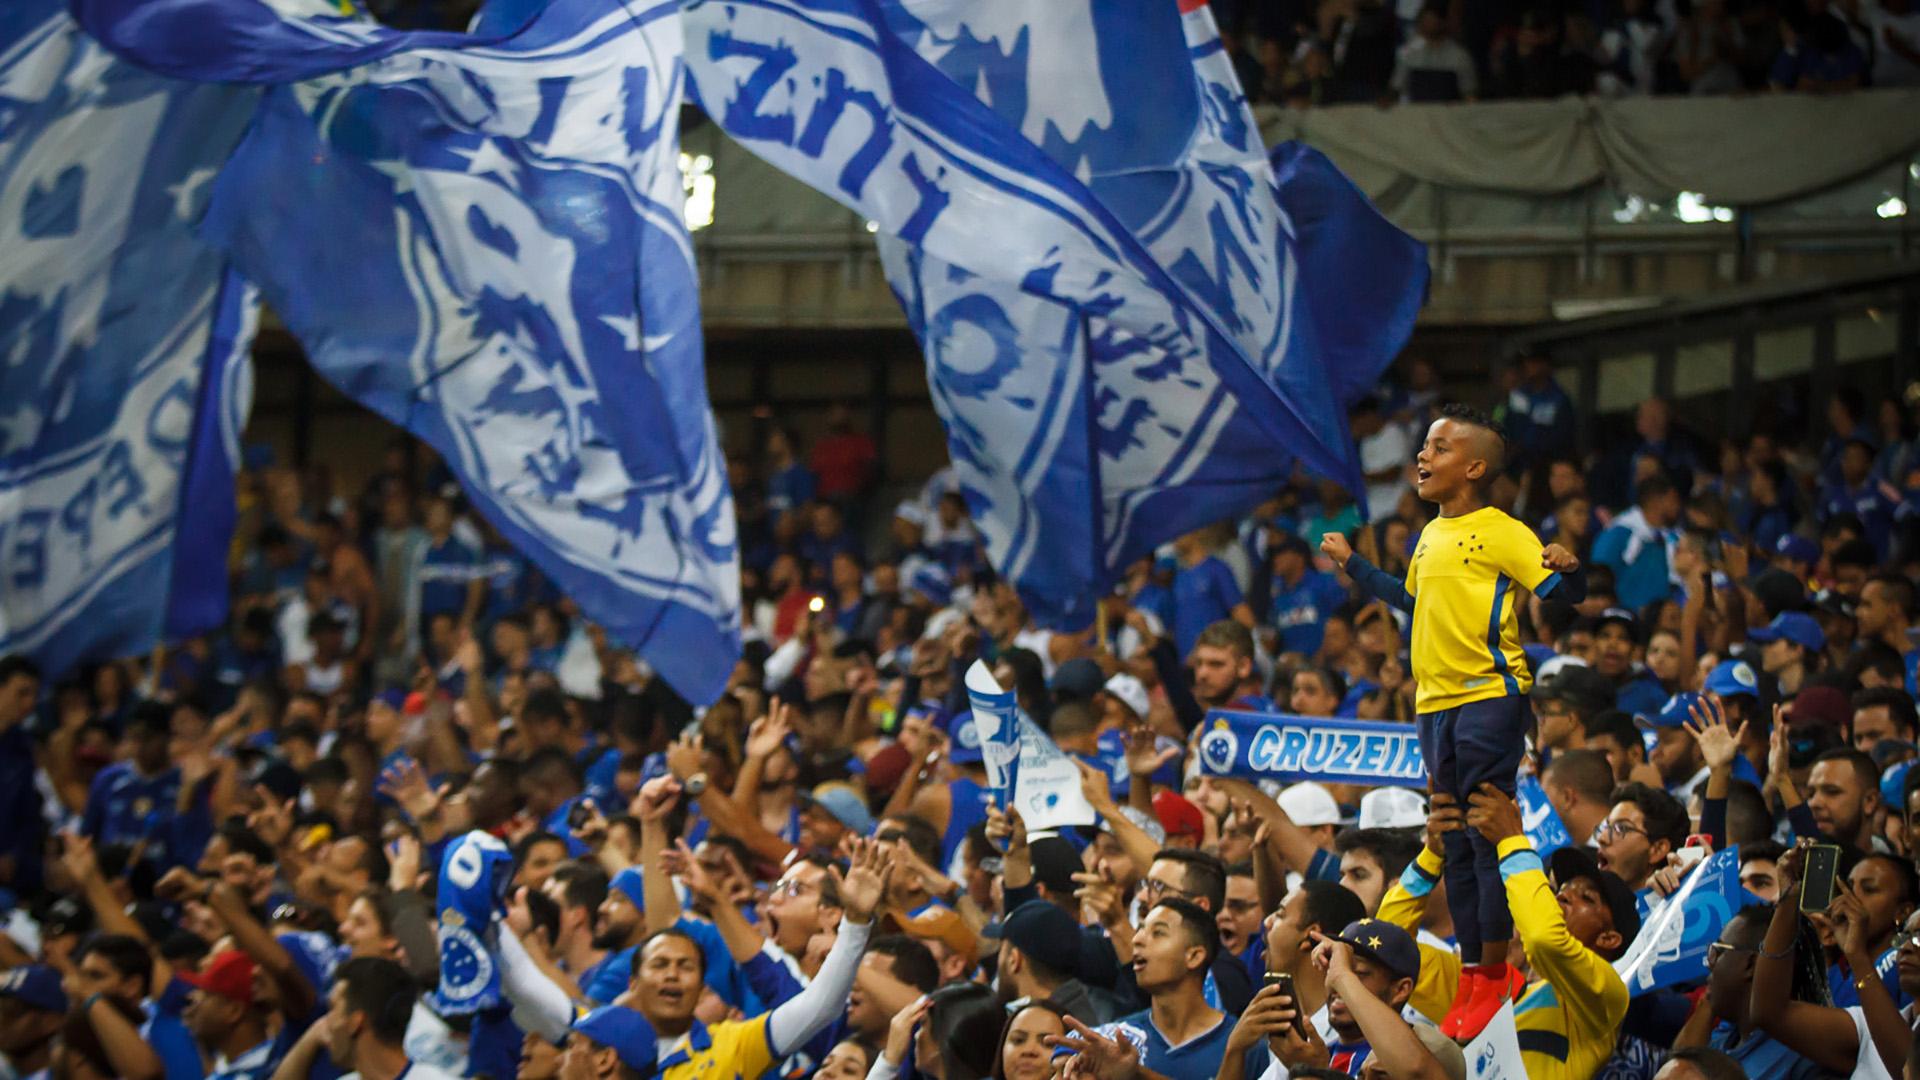 Torcida Cruzeiro Atlético-MG Copa do Brasil 11072019